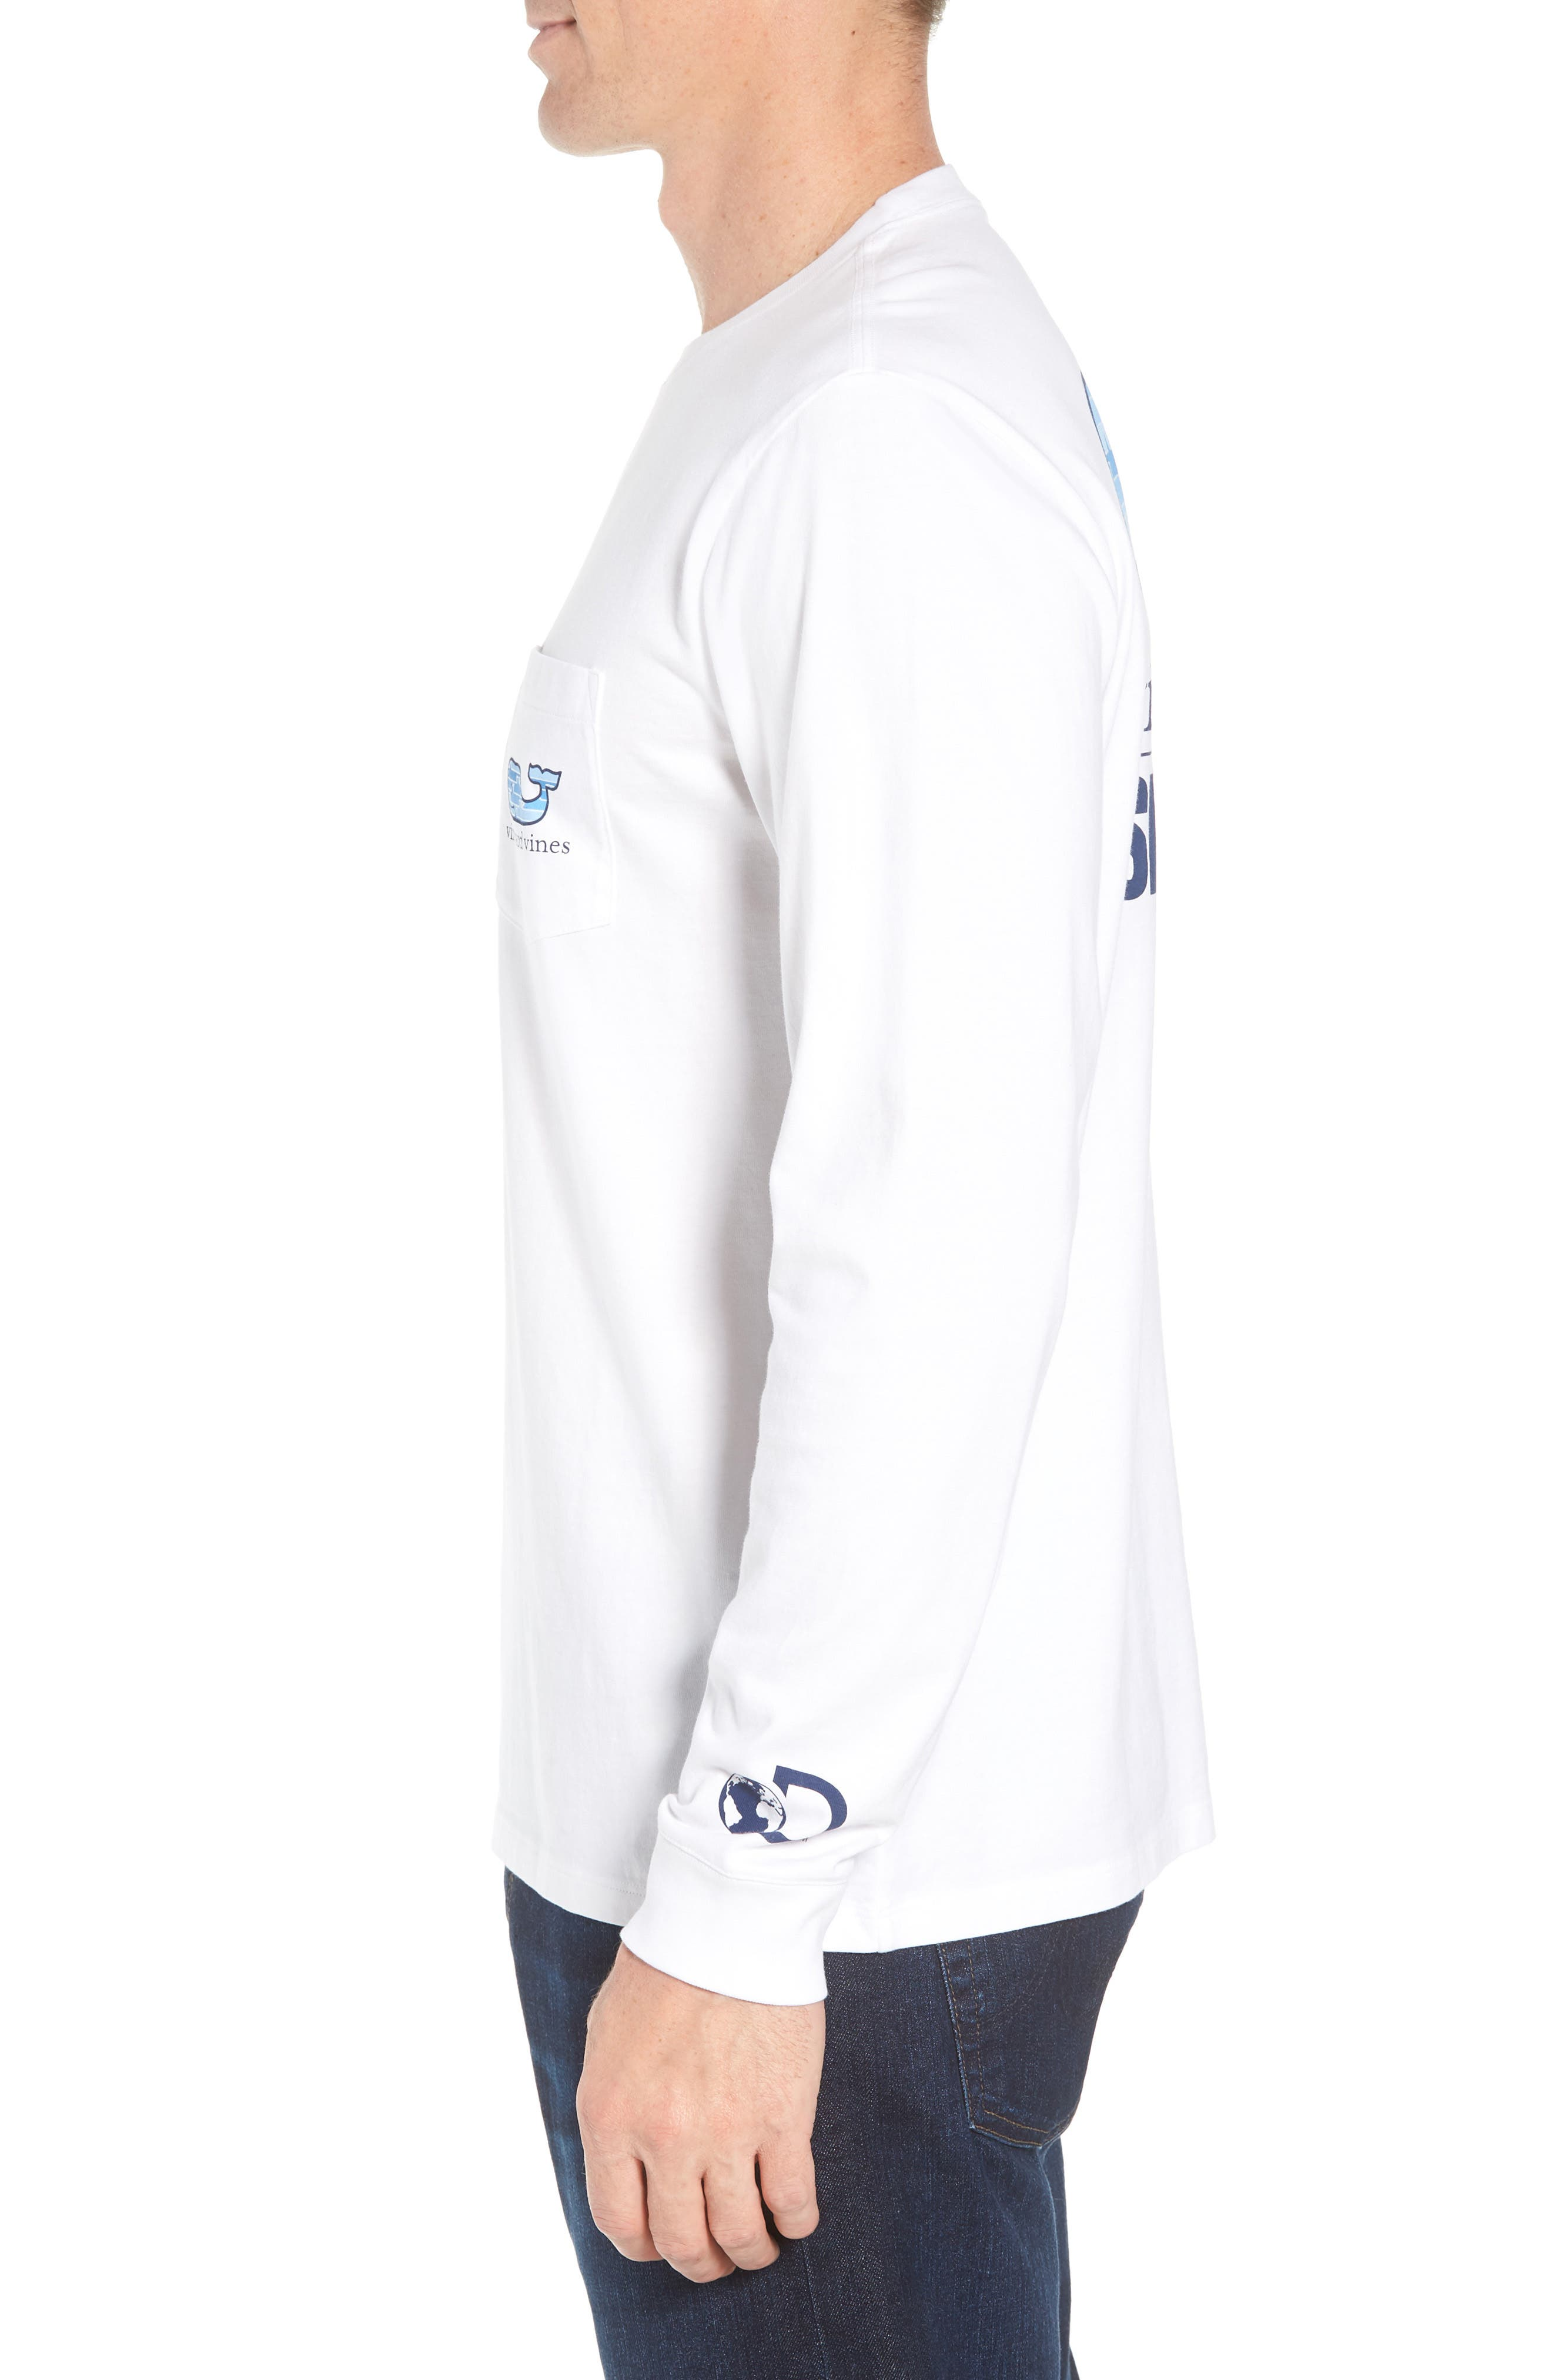 x Shark Week<sup>™</sup> Whaleline Long Sleeve Pocket T-Shirt,                             Alternate thumbnail 3, color,                             White Cap